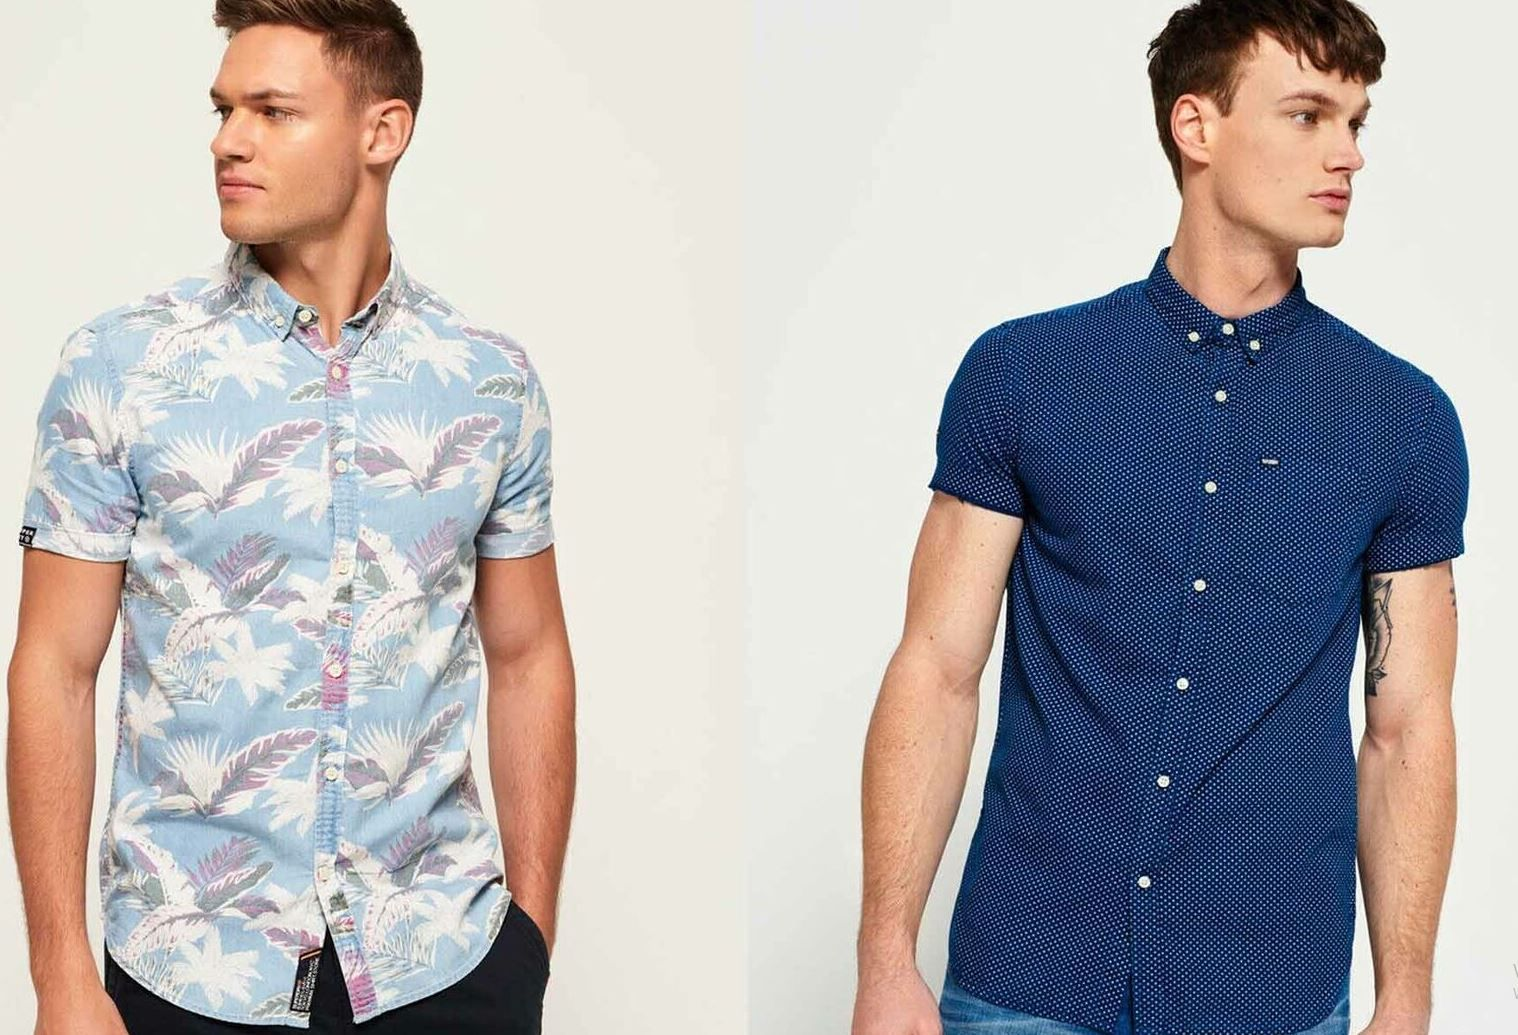 Superdry Herren Hemden   neue Modelle für je 27€ (statt 36€)